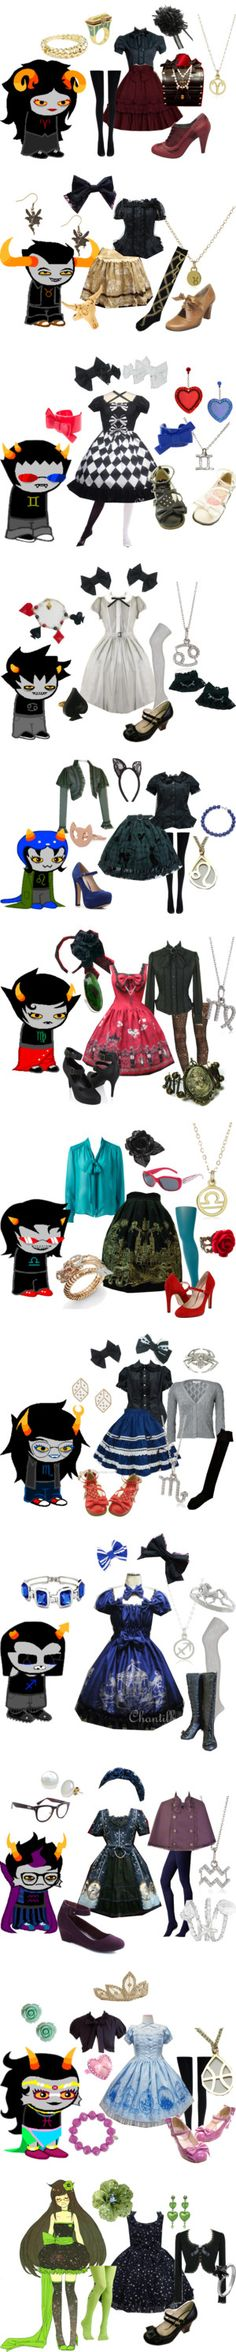 """Homestuck Lolitas"" by meiki ❤ liked on Polyvore"